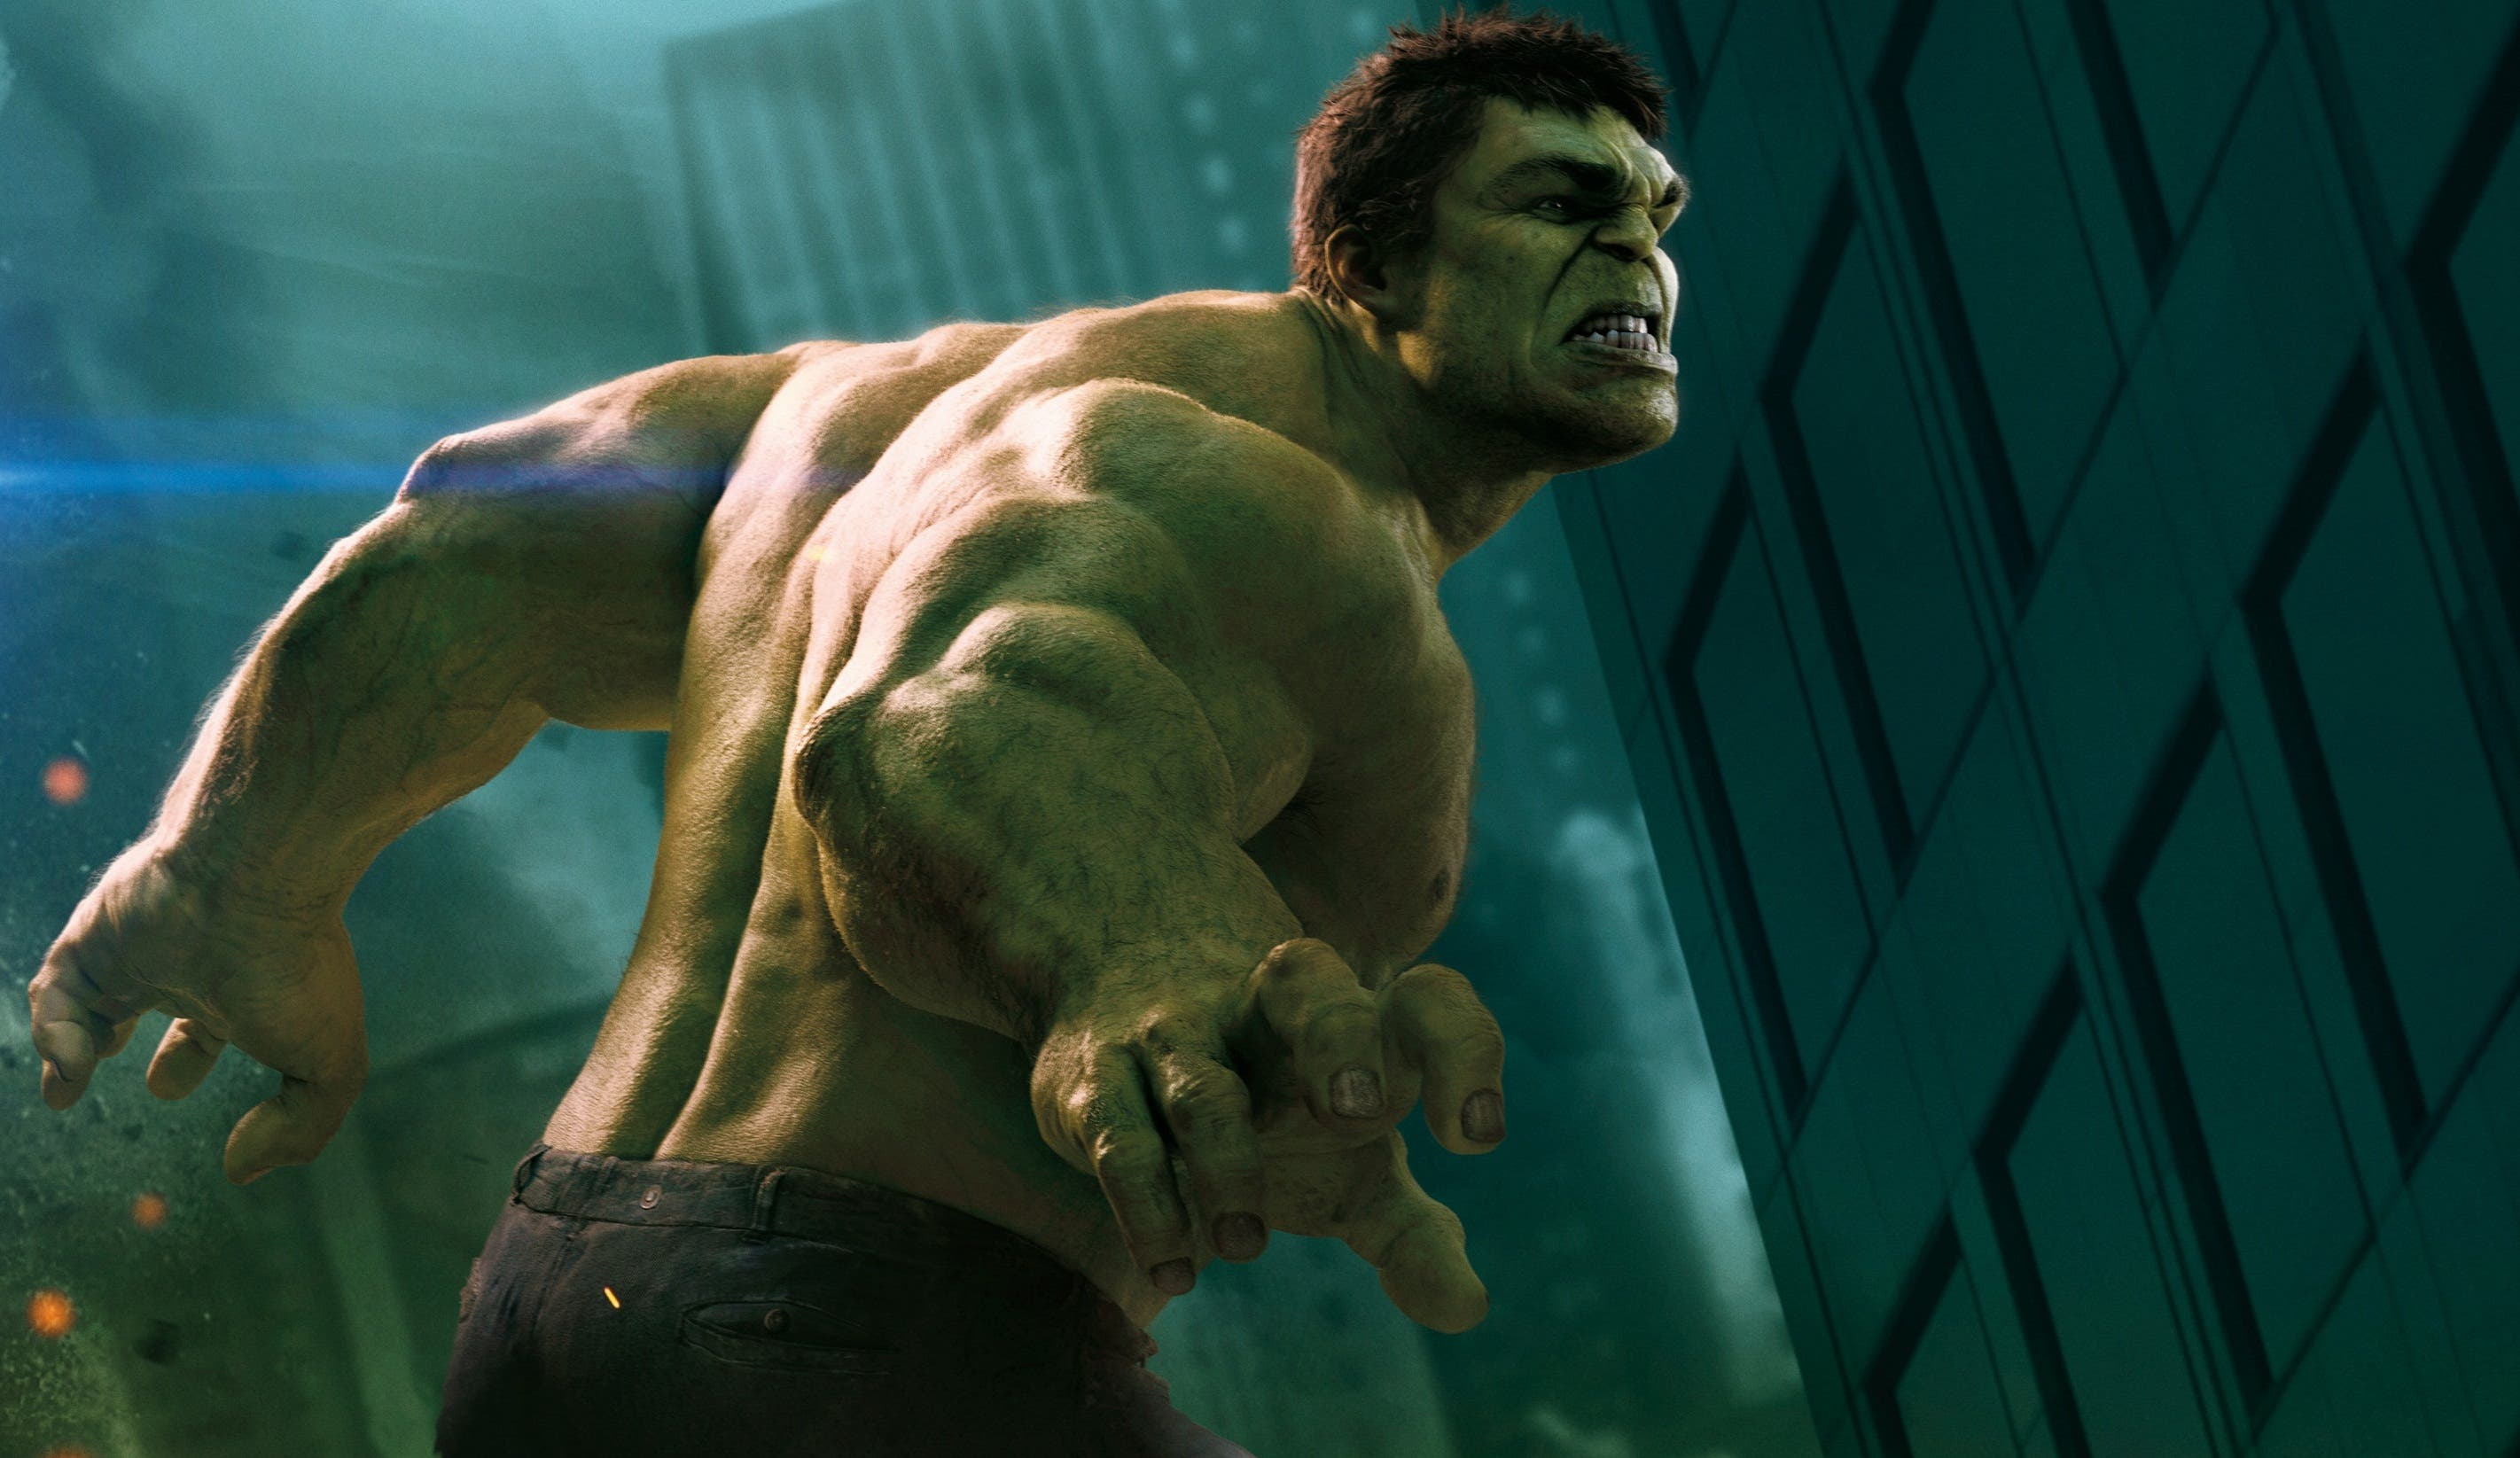 Hulk THE AVENGERS - Vengadores